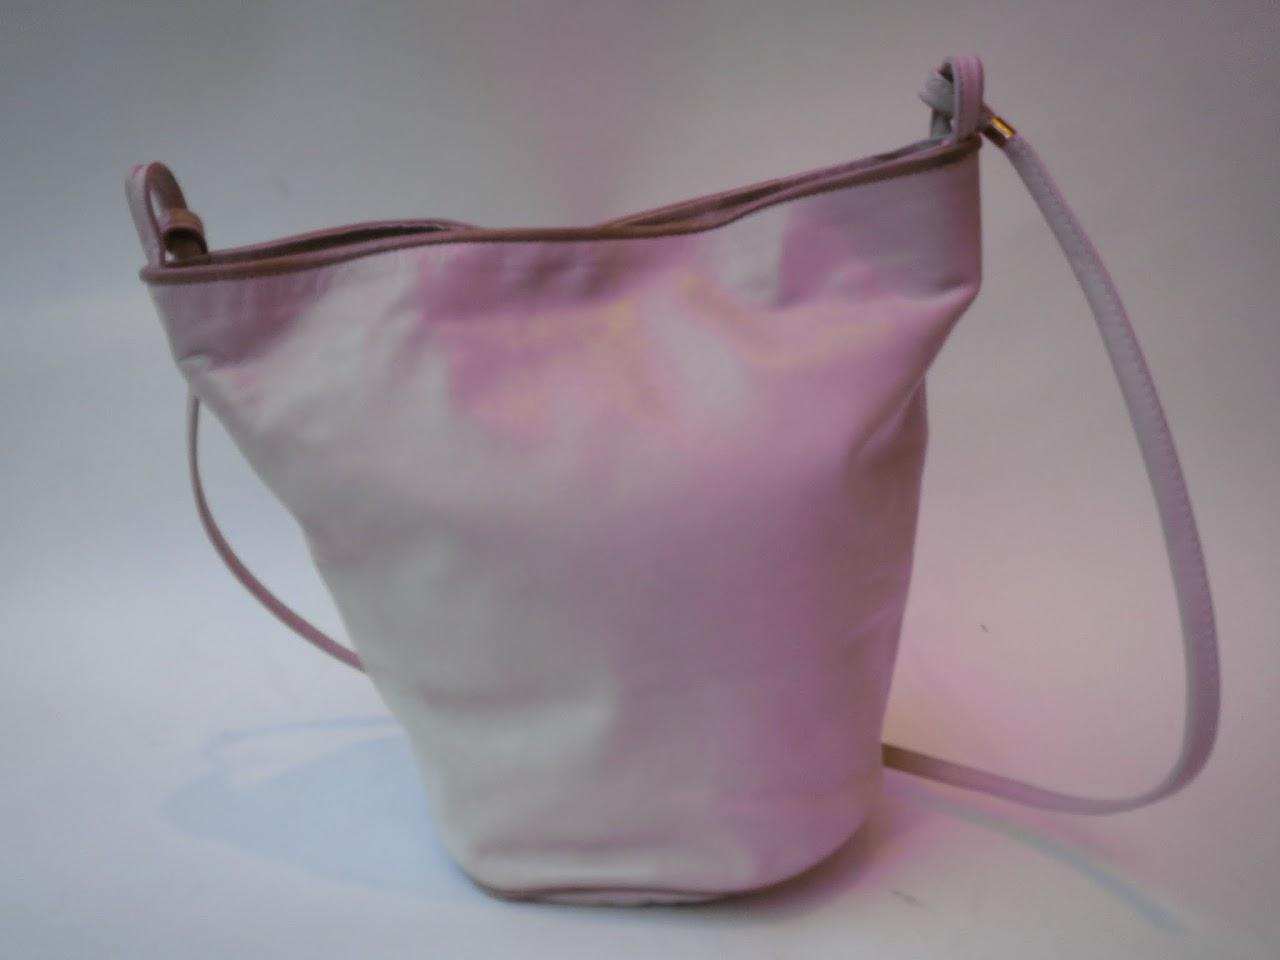 Vintage Bonwit Teller Bucket Bag